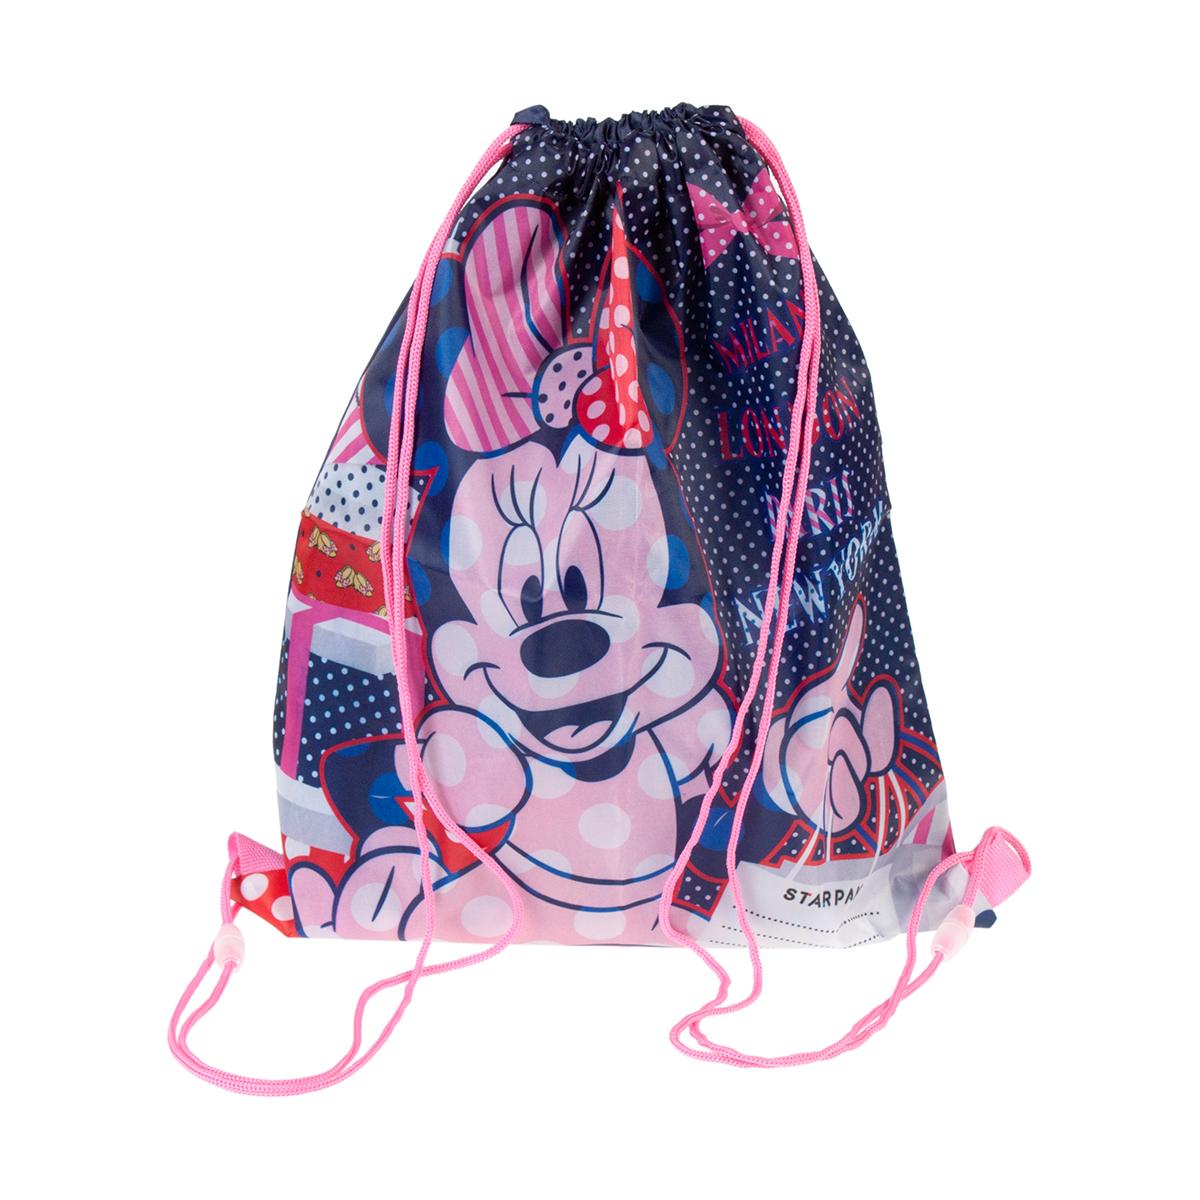 Rucsac Starpak, Minnie Mouse, 38 cm